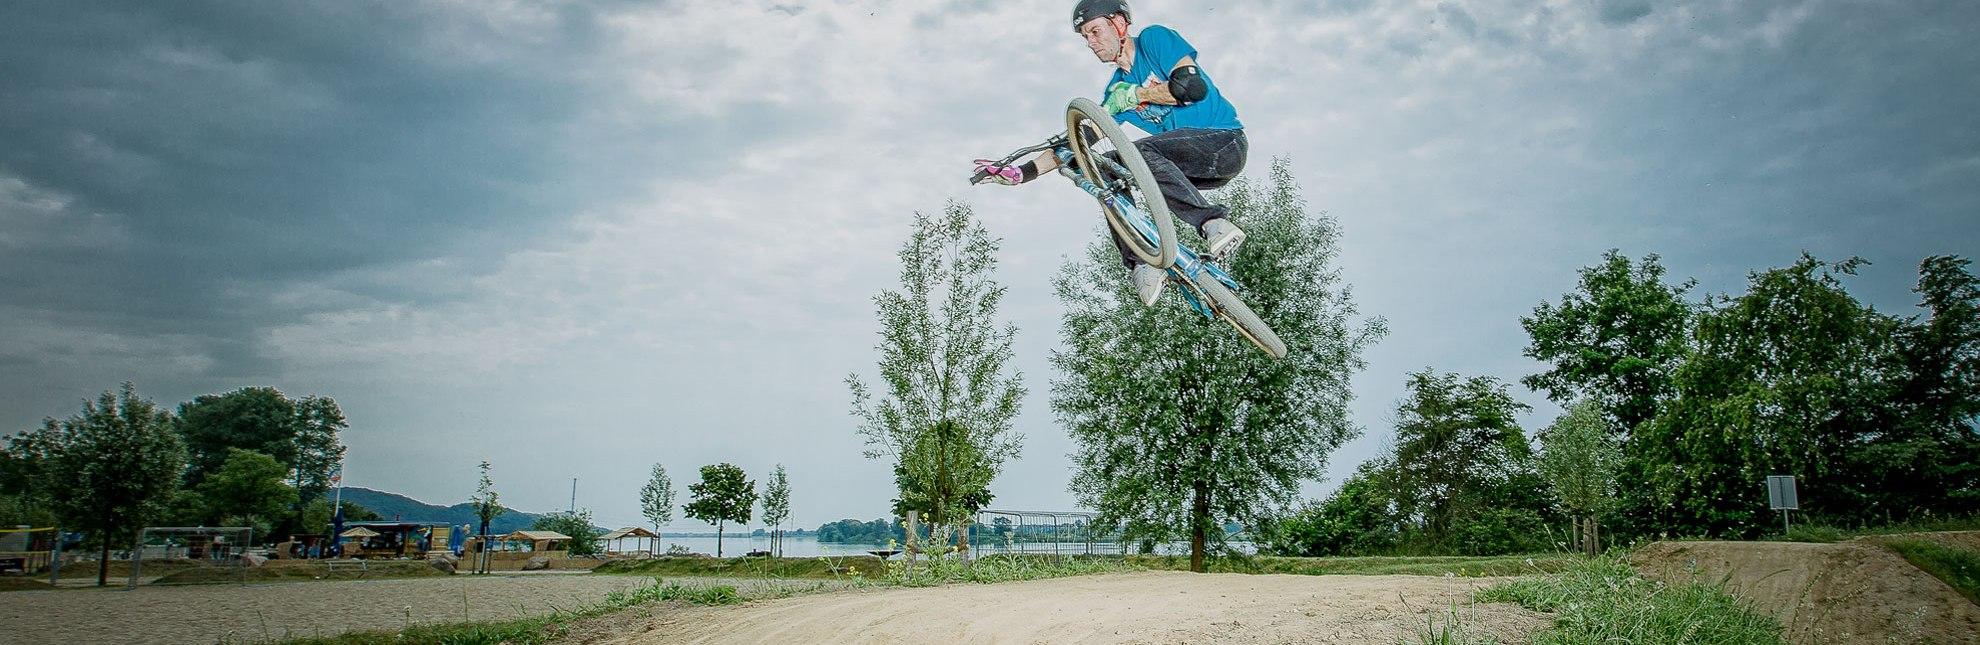 Biker auf dem Dirt Bike Parcours Geesthacht, © Kai Treffan Fotografie